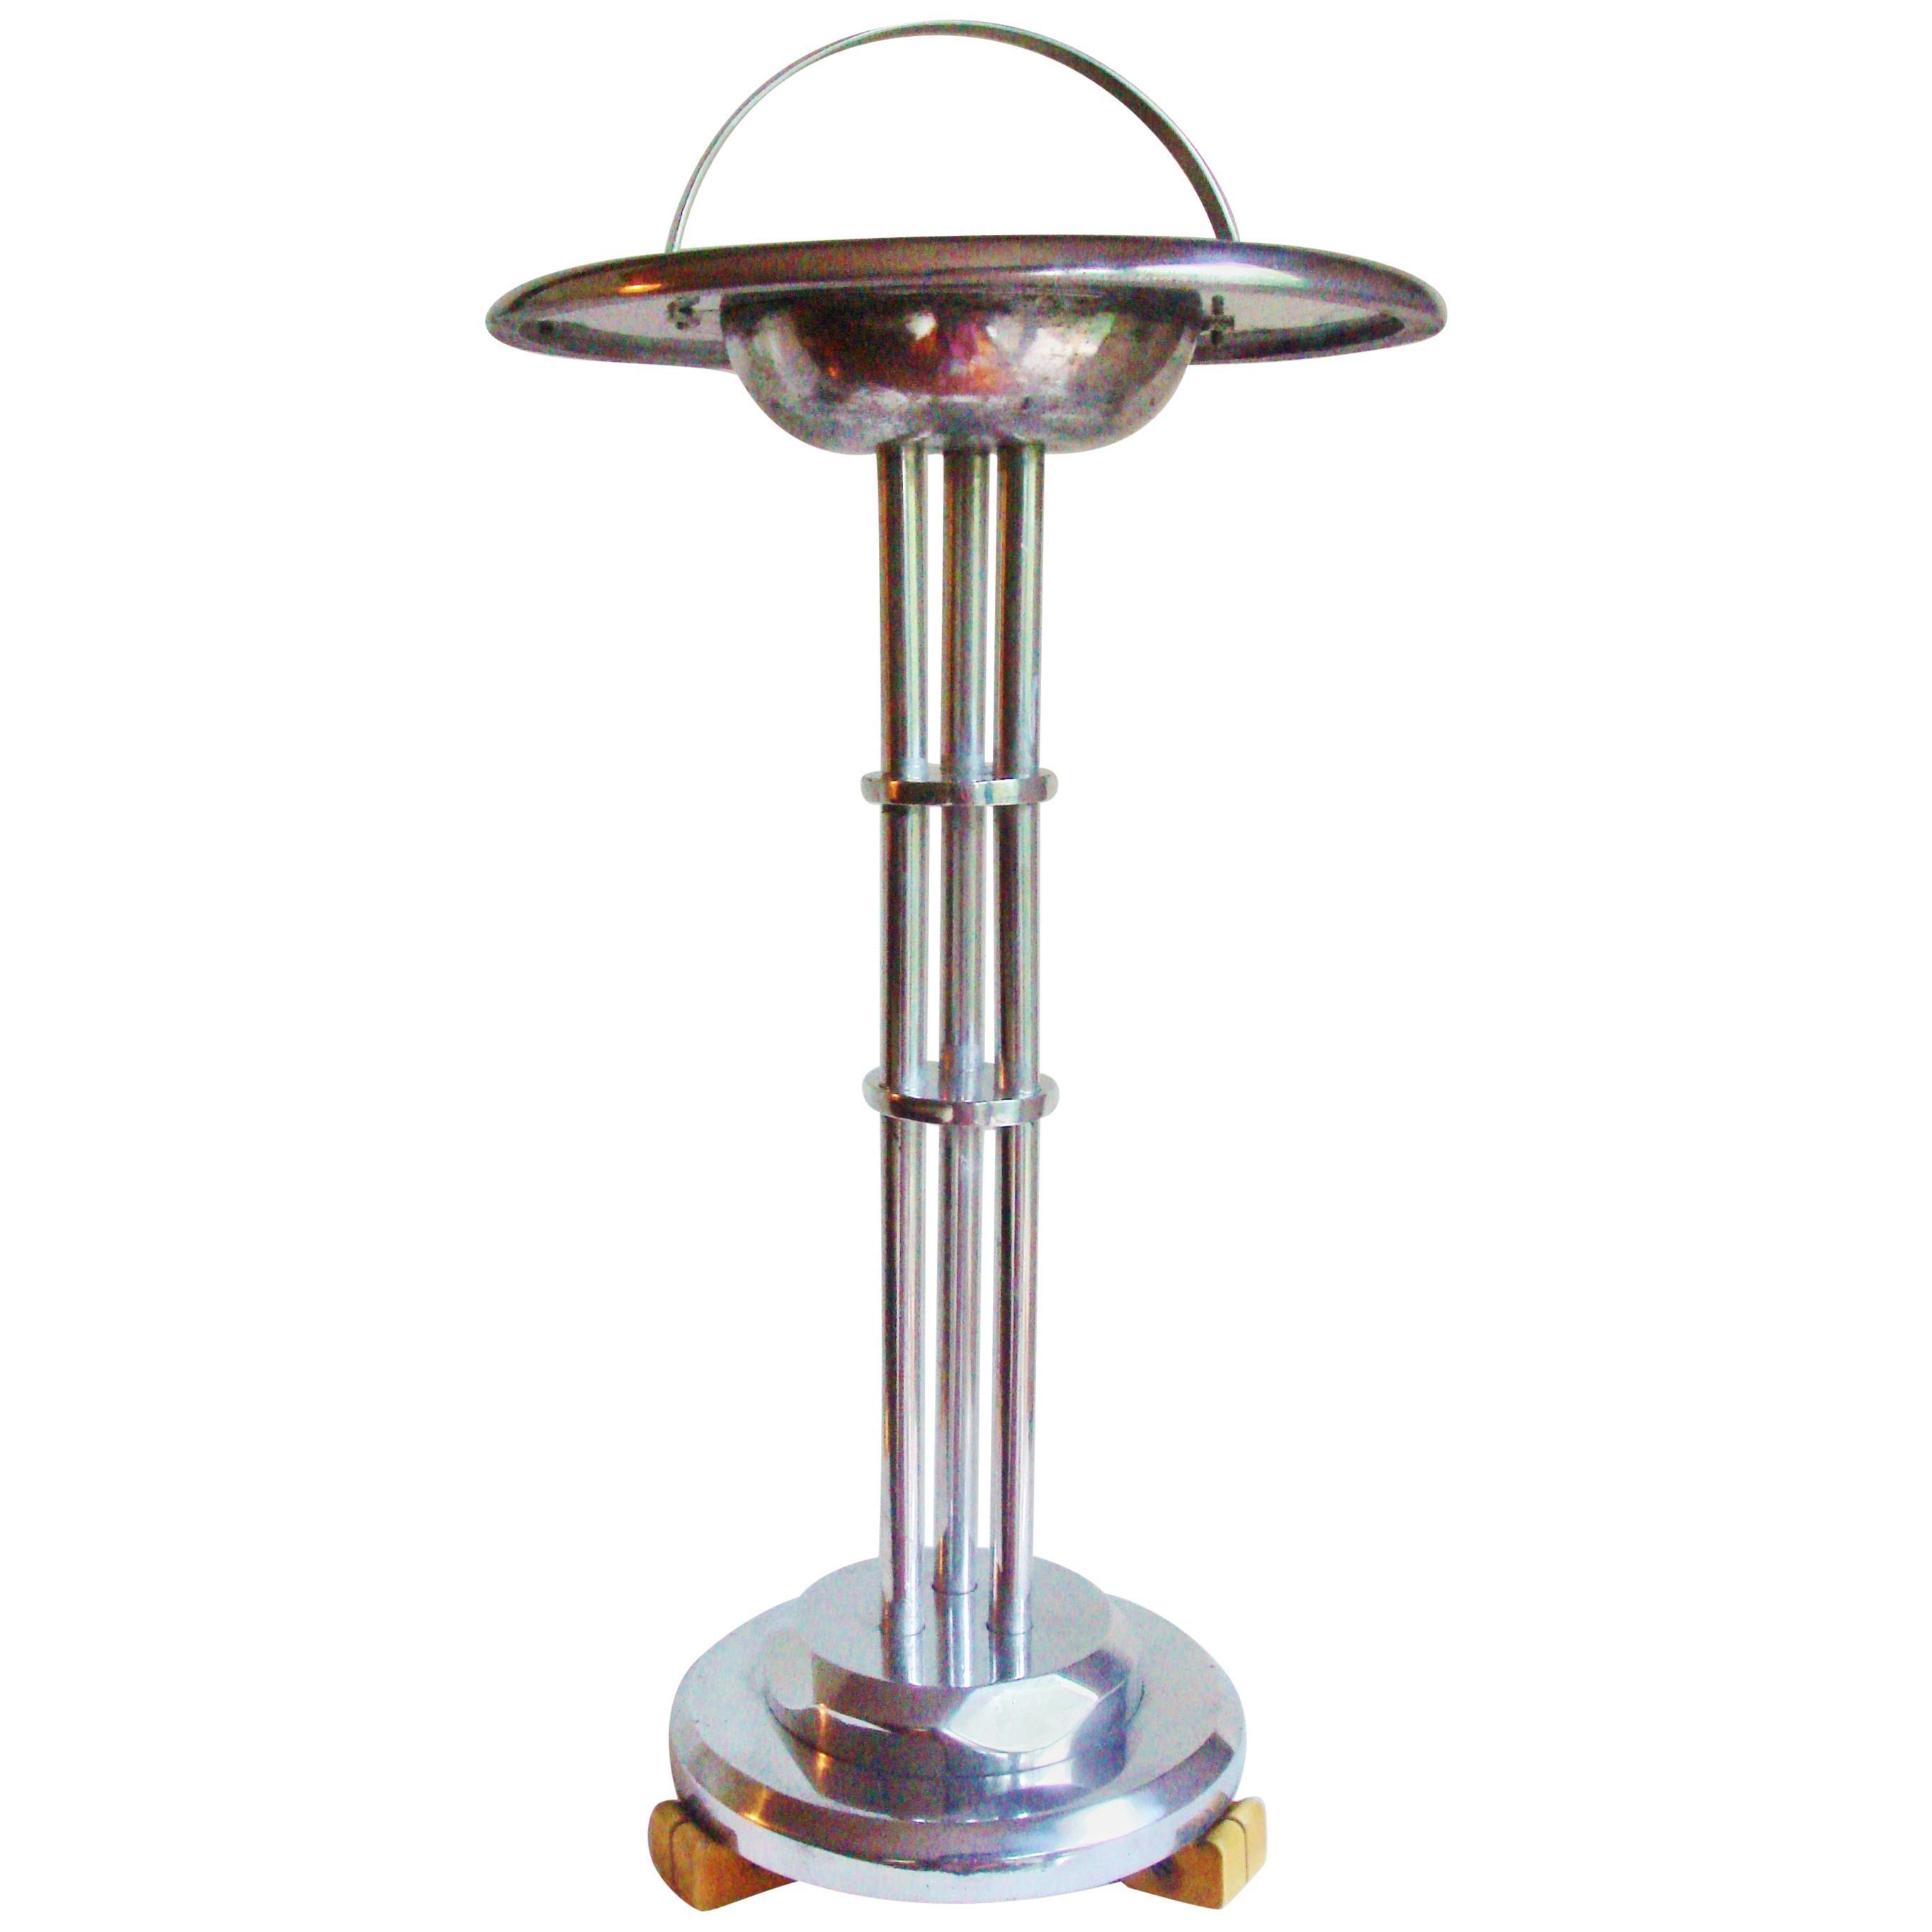 American Art Deco Cast Aluminum and Bakelite Floor Standing Ashtray Table